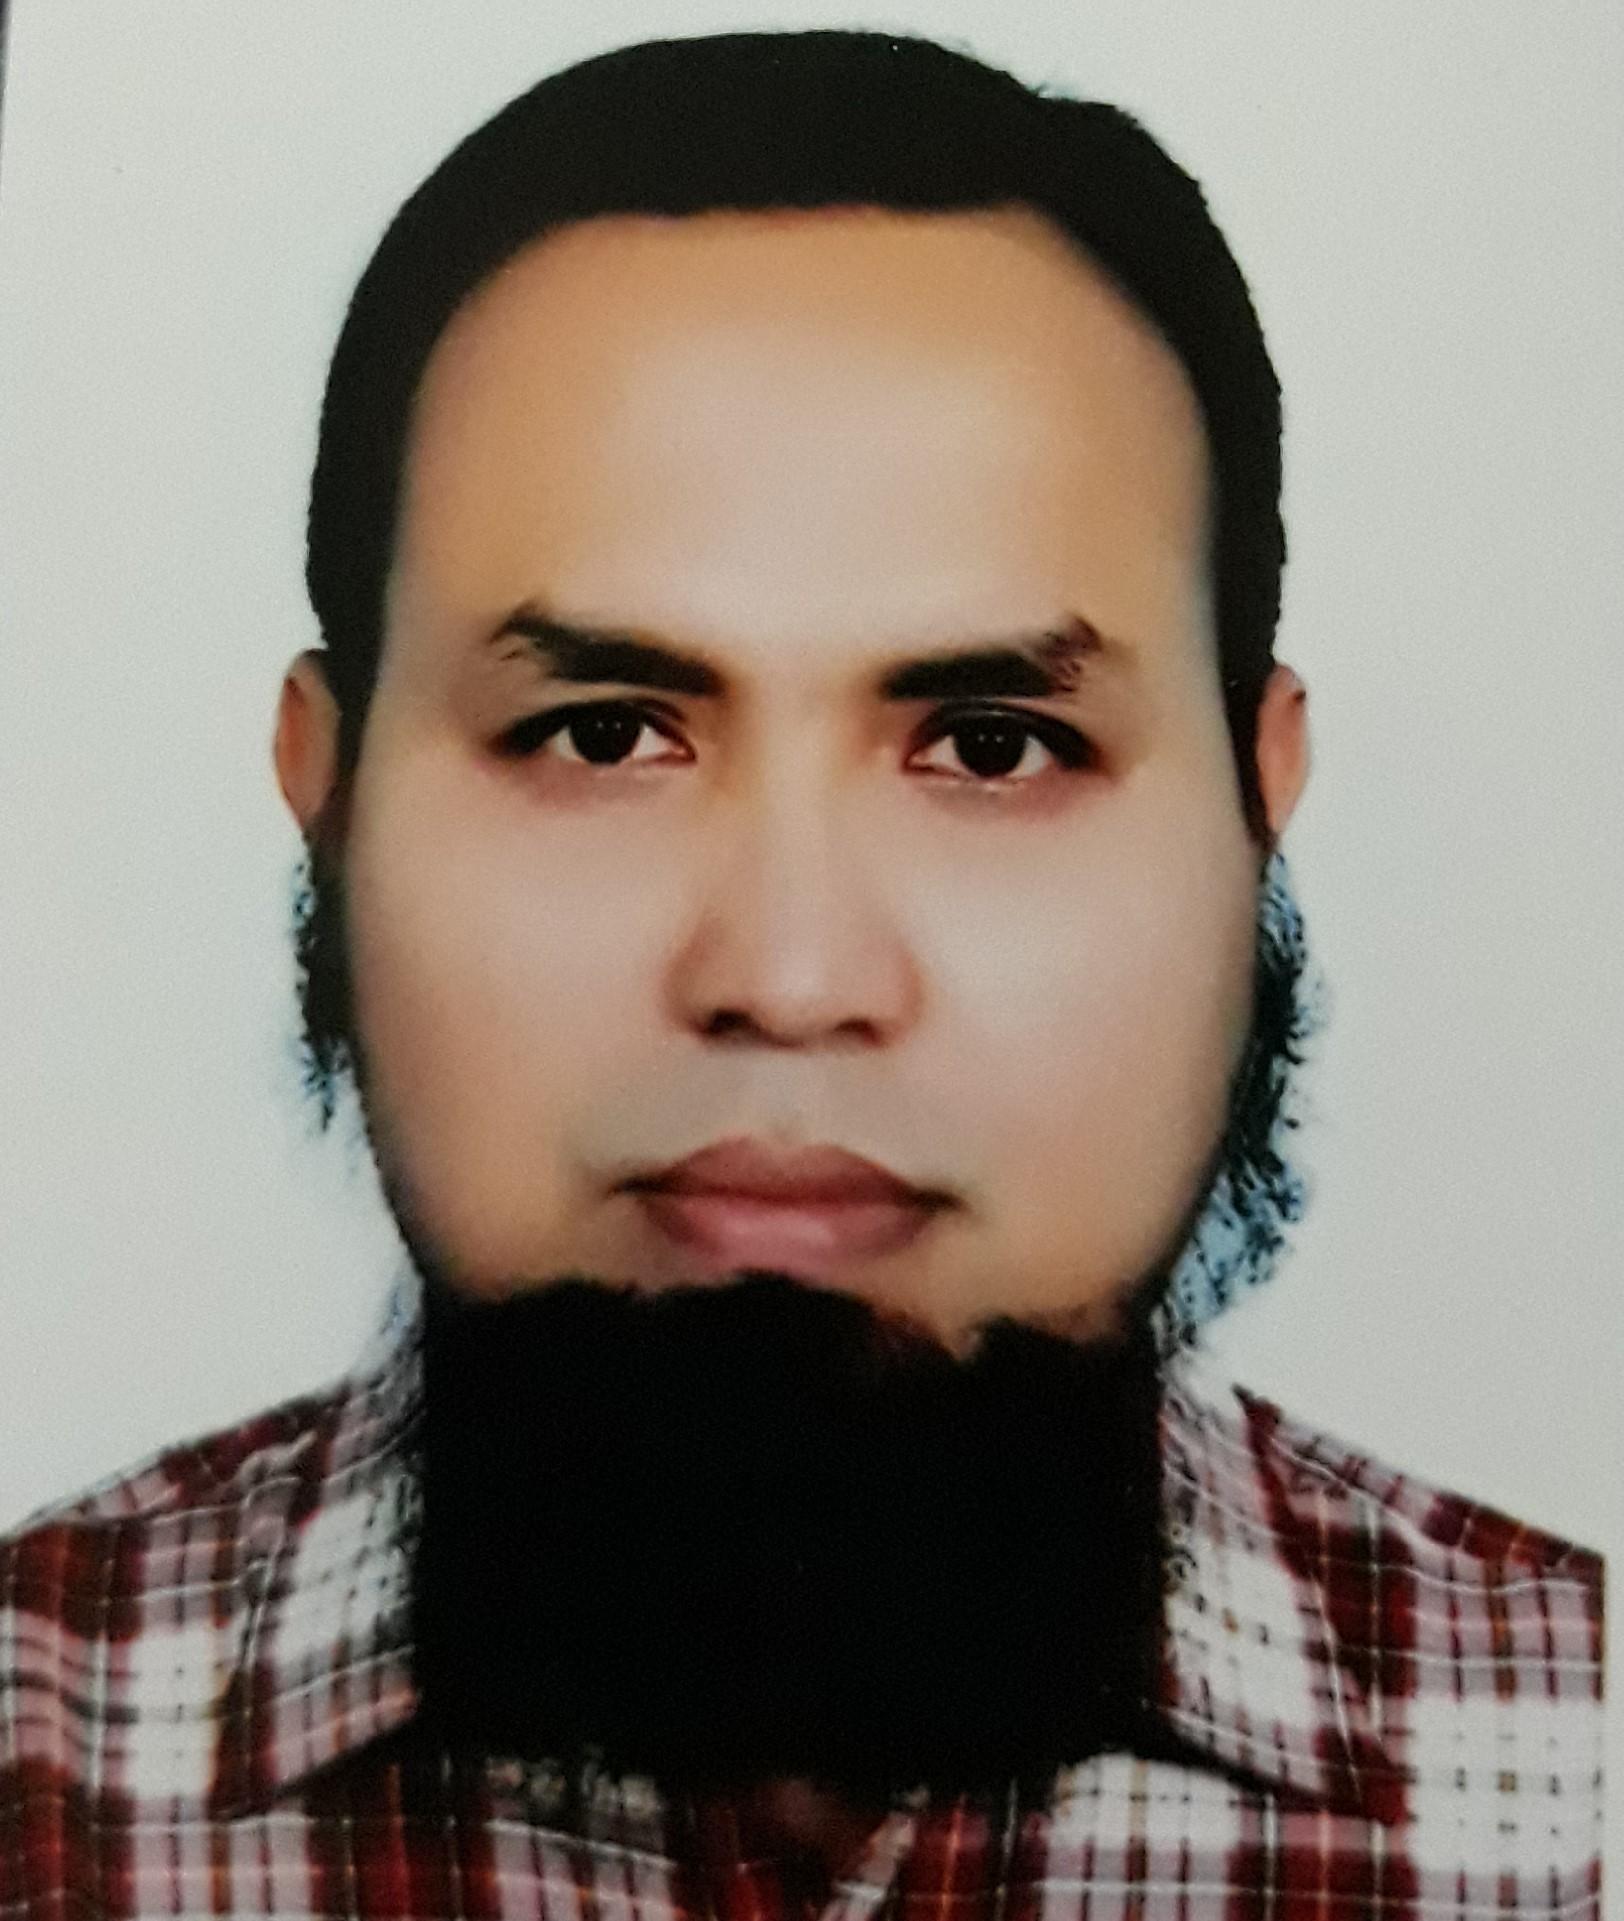 Abu Hena Muhammad Yousuf